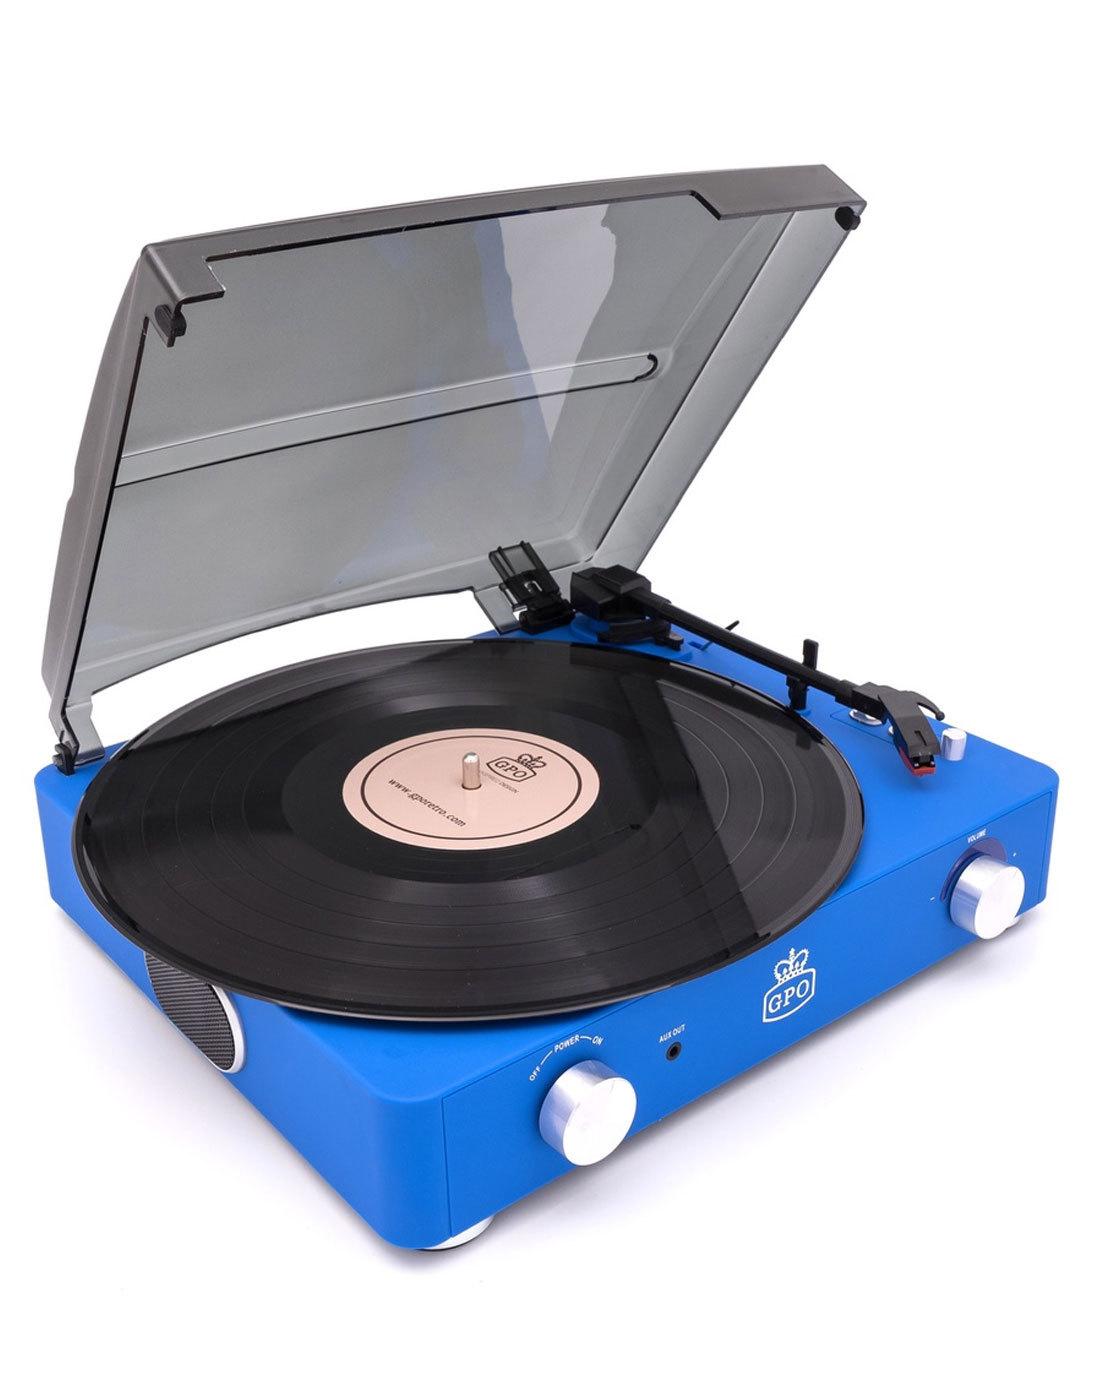 Stylo II GPO RETRO Mod Record Player - Cobalt Blue